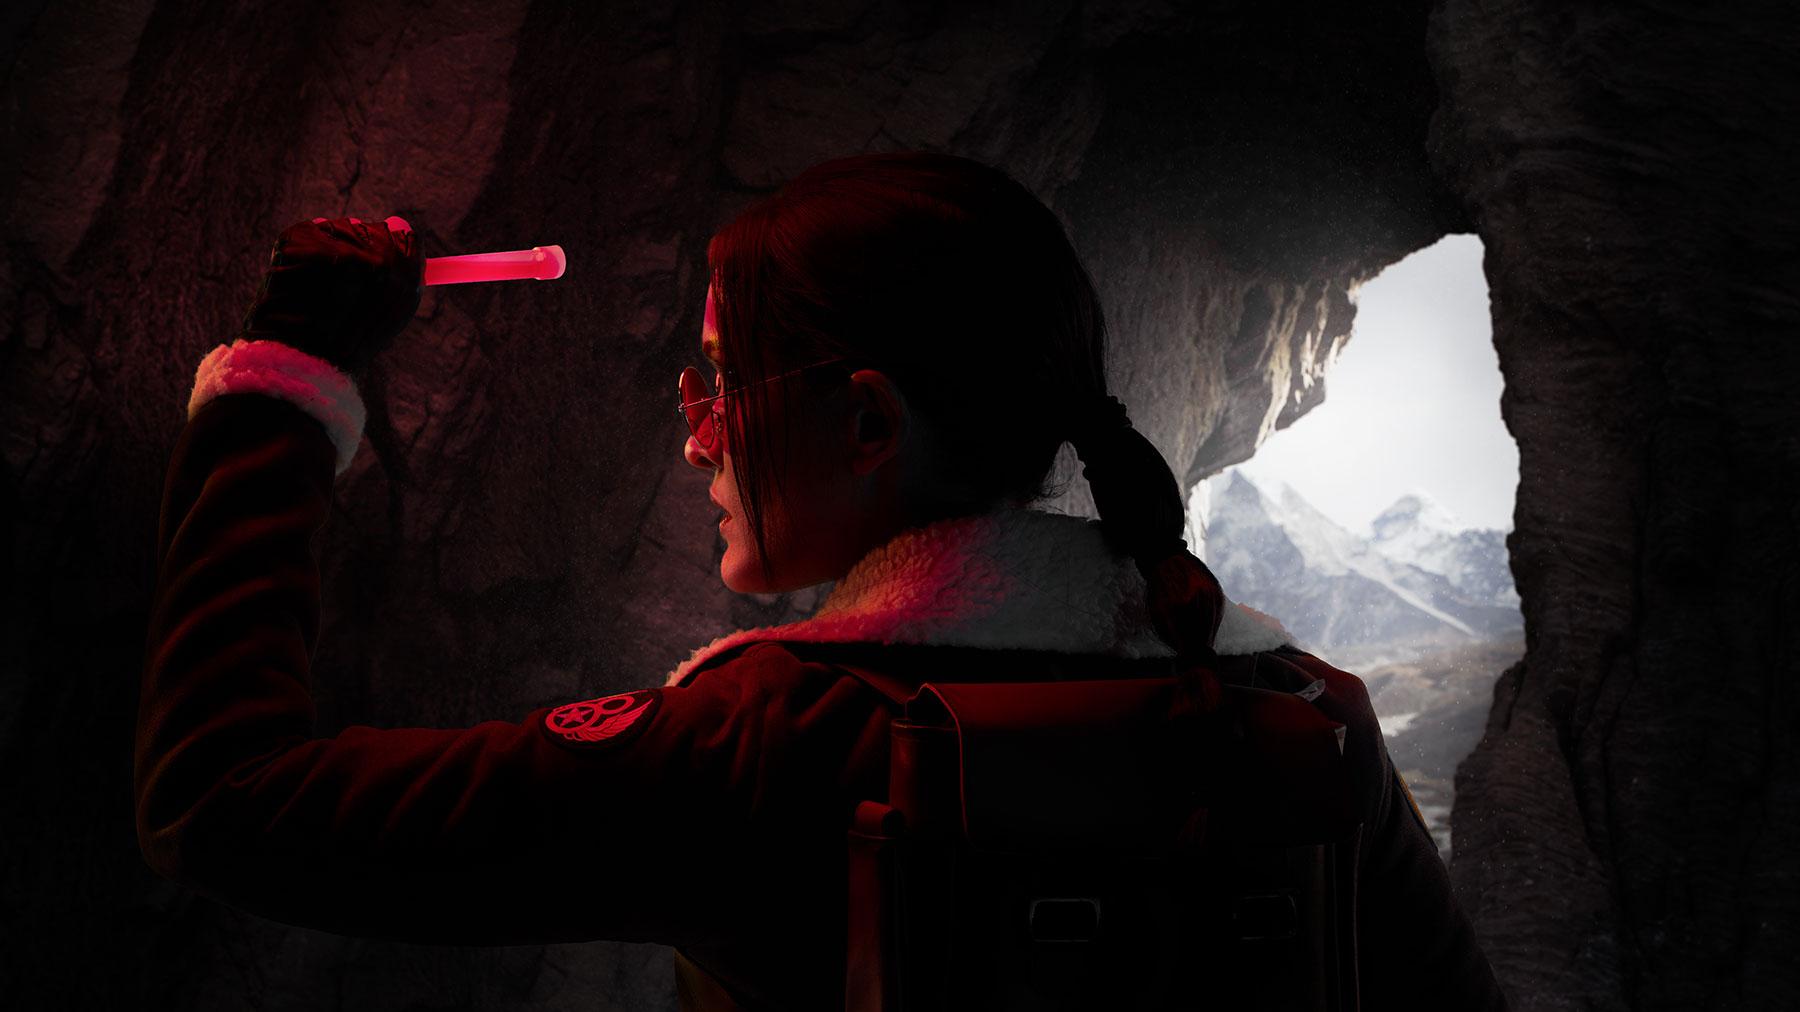 Arthur Sayanoff Tomb Raider 2 04 07